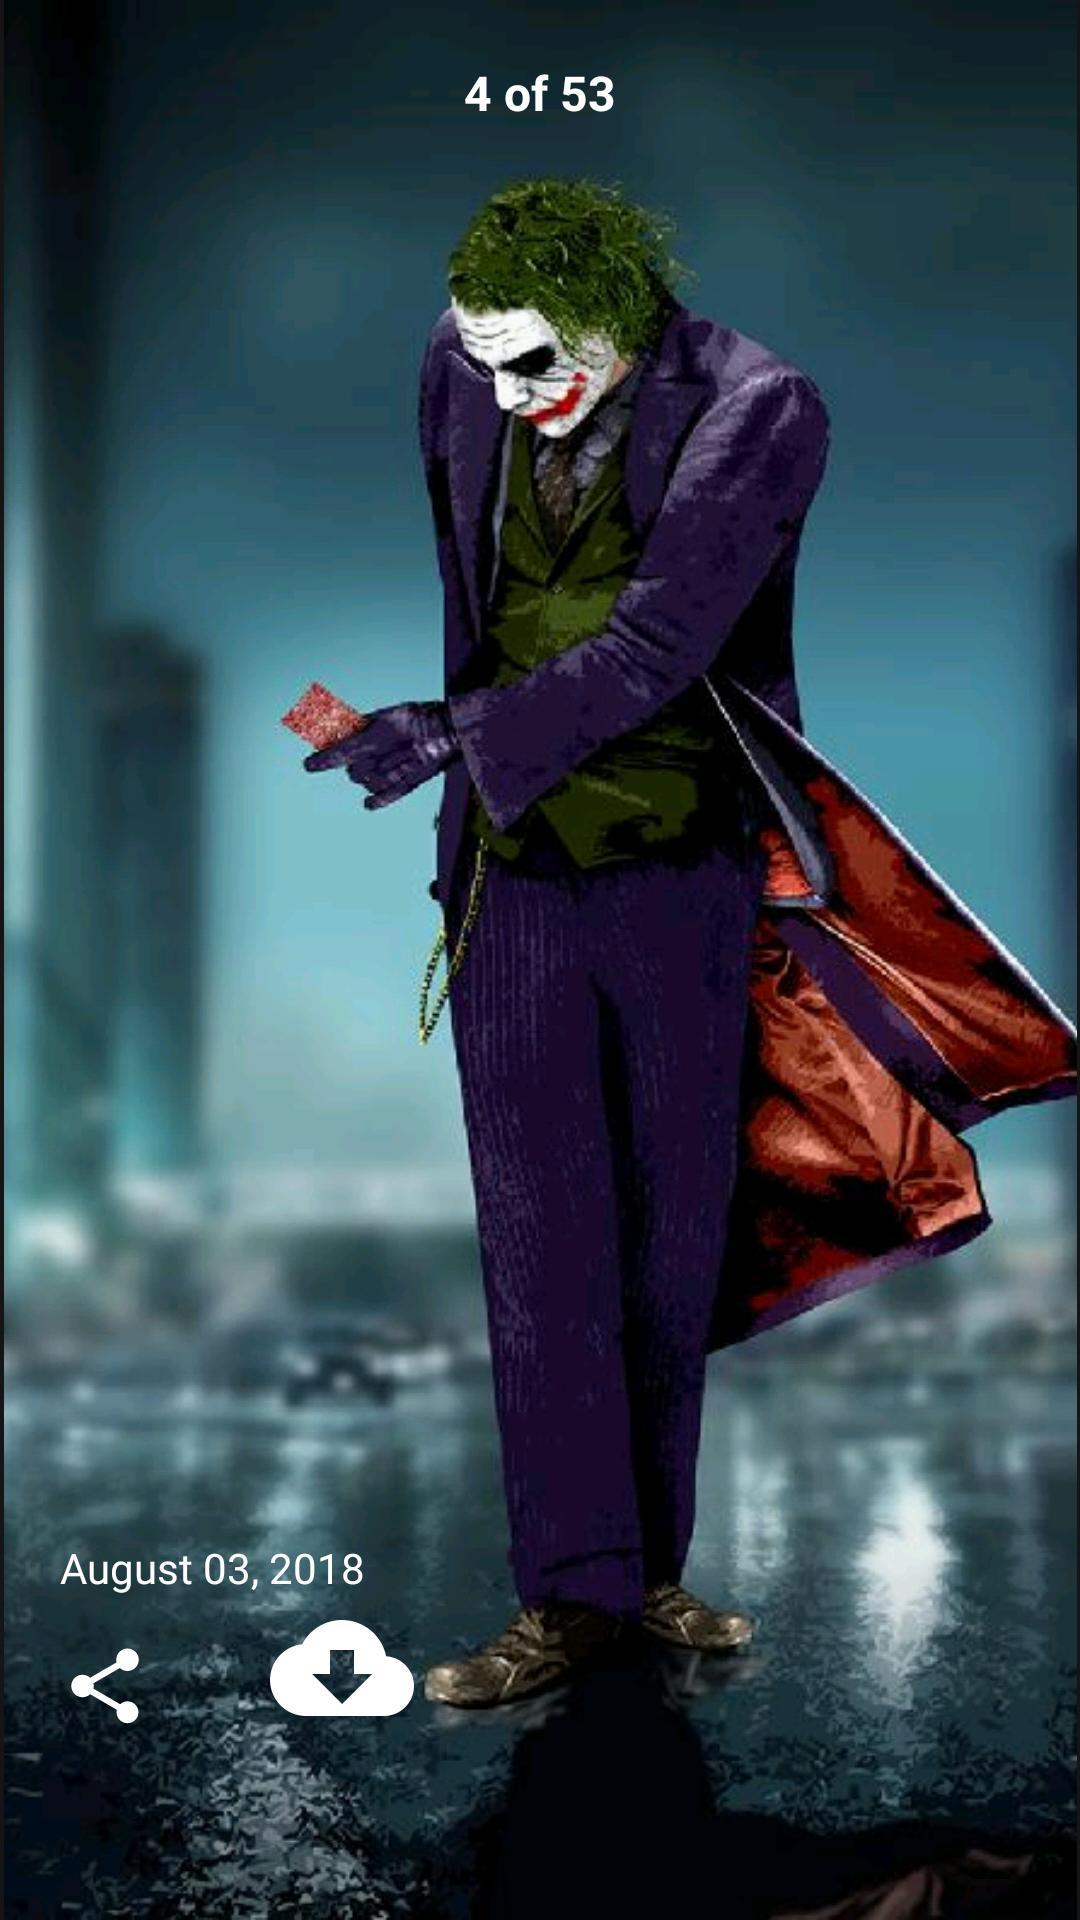 Download Wallpaper Joker Hd Android Hd Cikimm Com